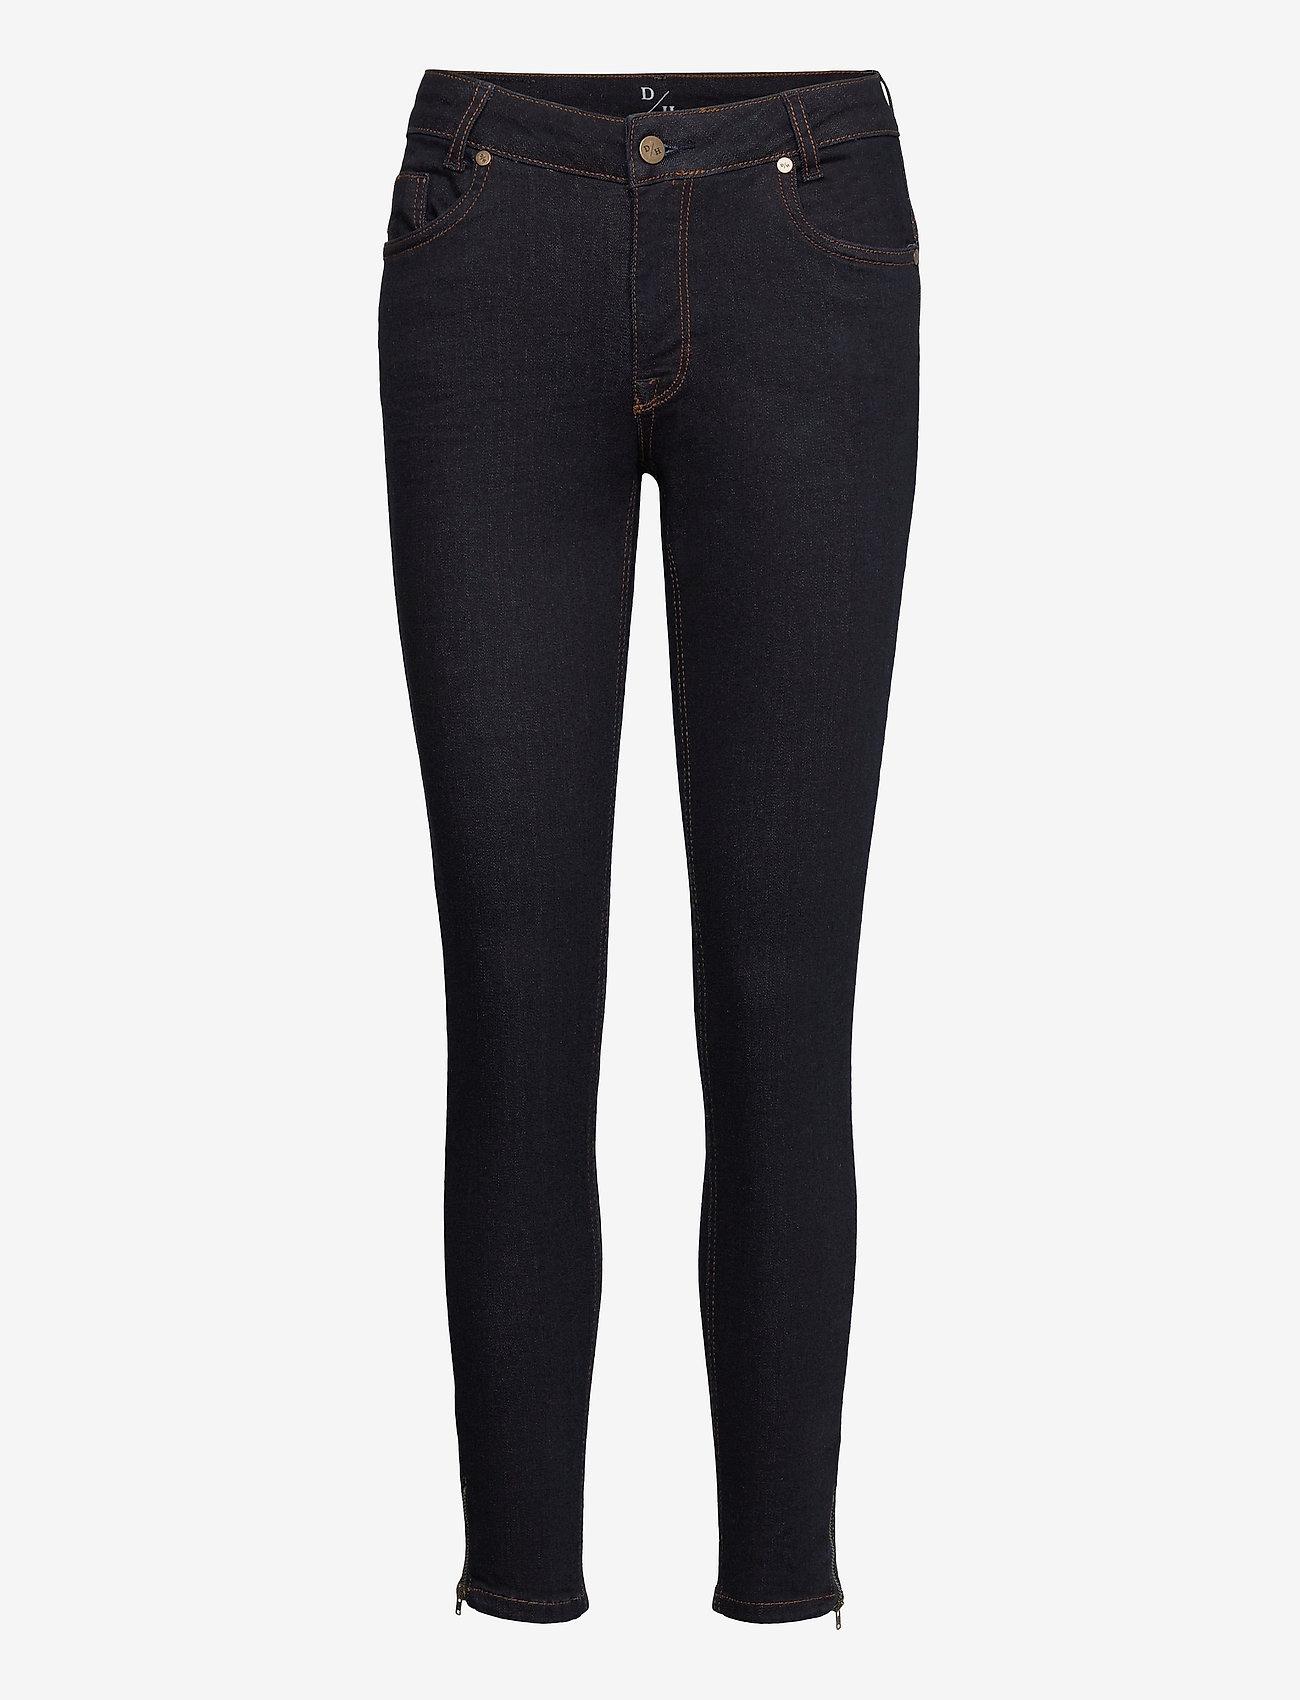 Denim Hunter - 31 THE CELINAZIP TENNA CUSTOM - slim jeans - dark blue un-wash - 0